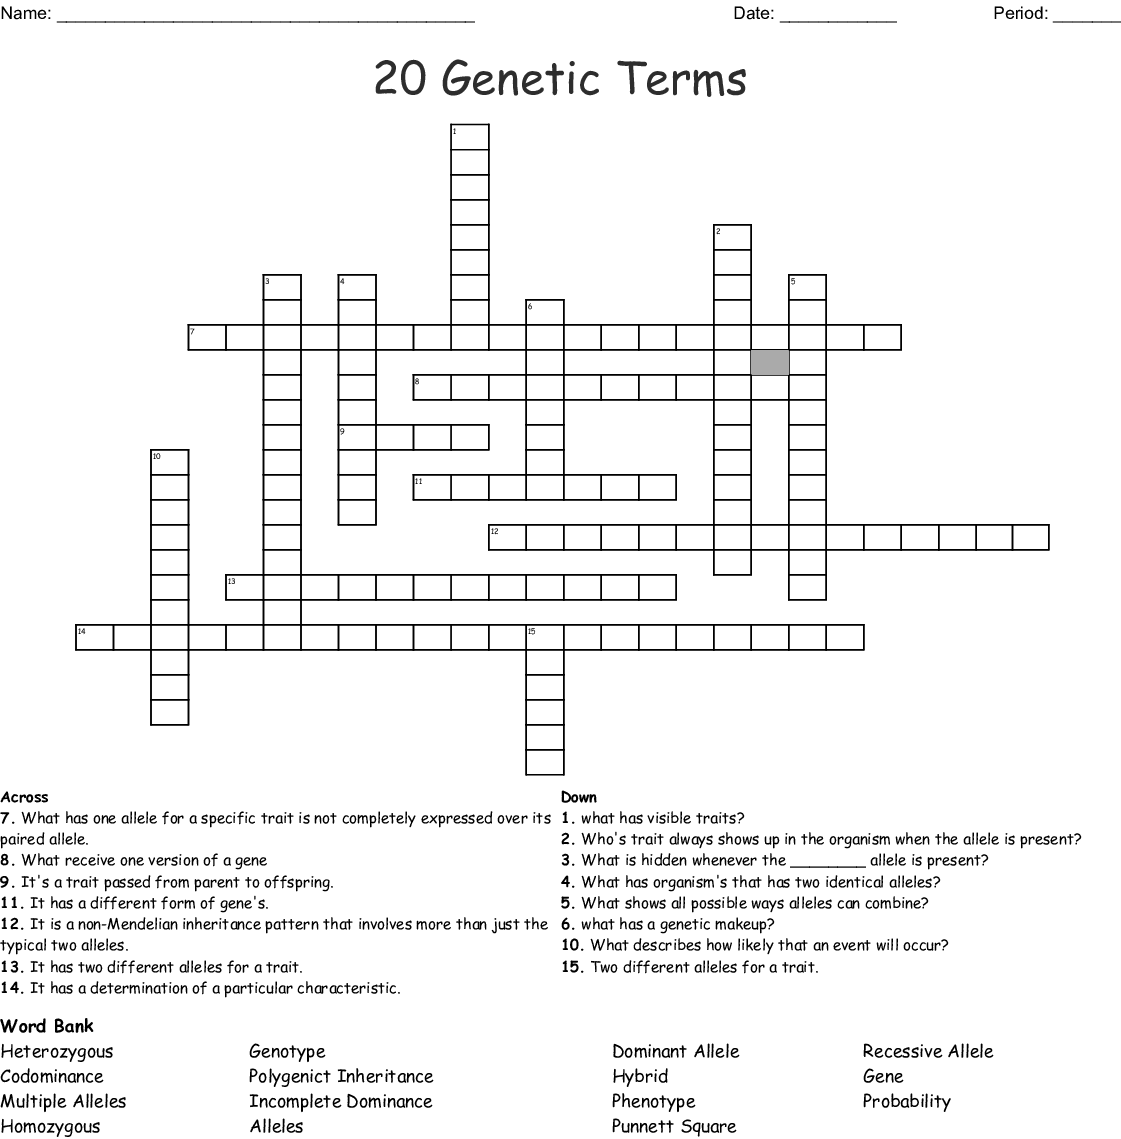 20 Genetic Terms Crossword